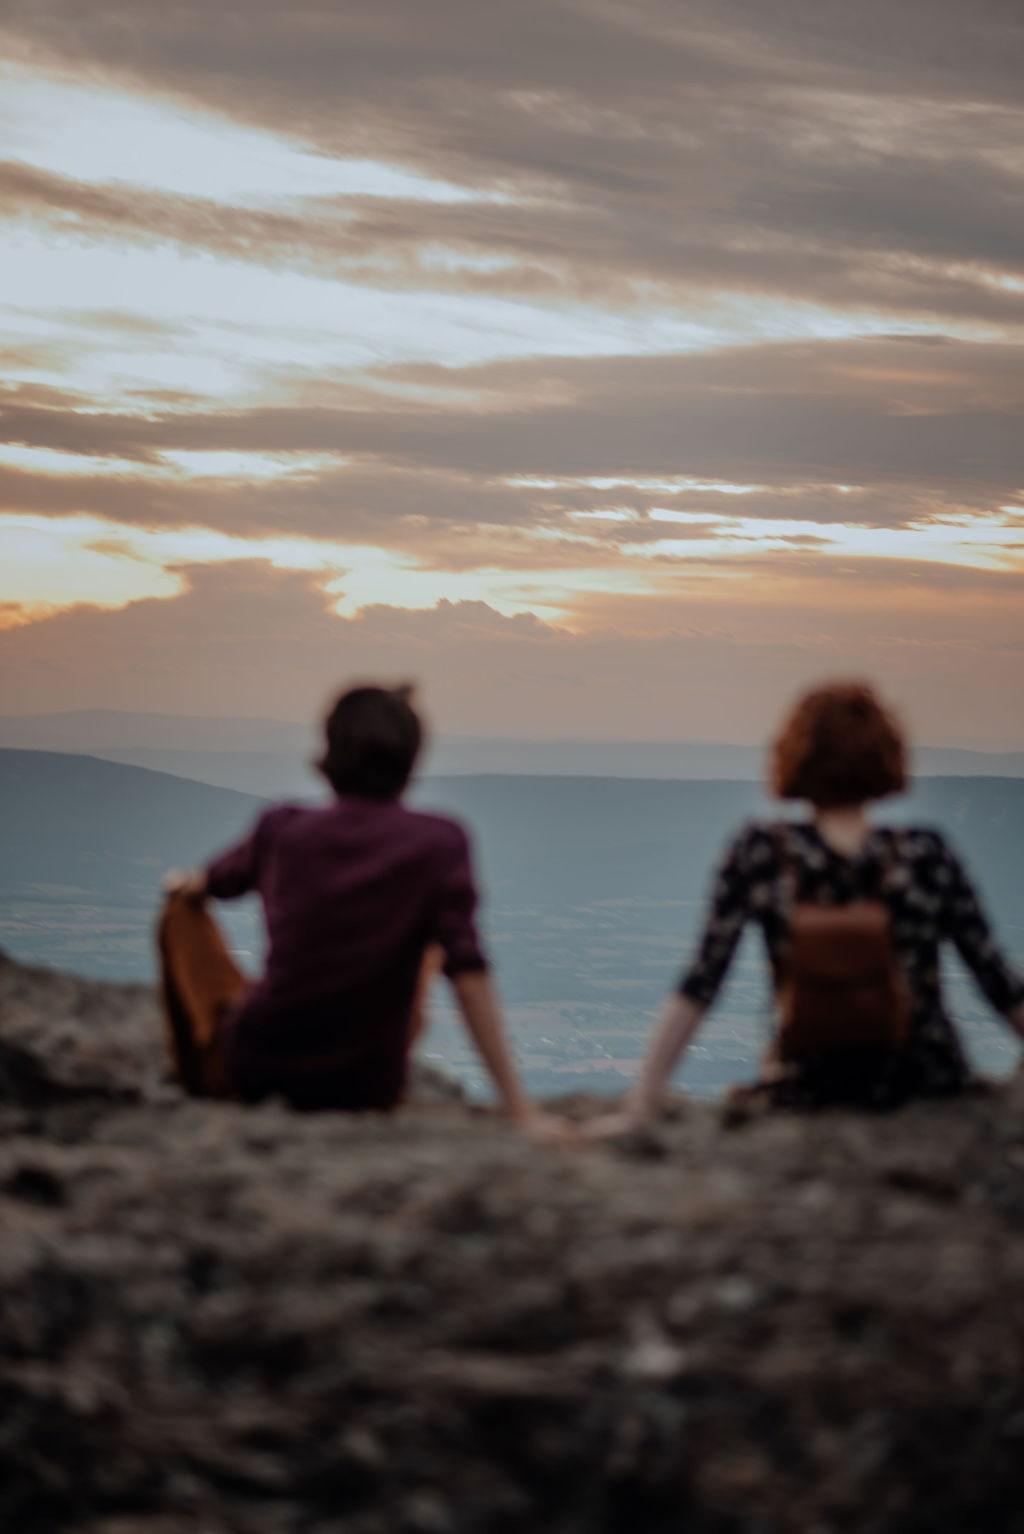 Jess-and-Amir_Shenandoah-AdventureSession-Flit-Photography-170-min